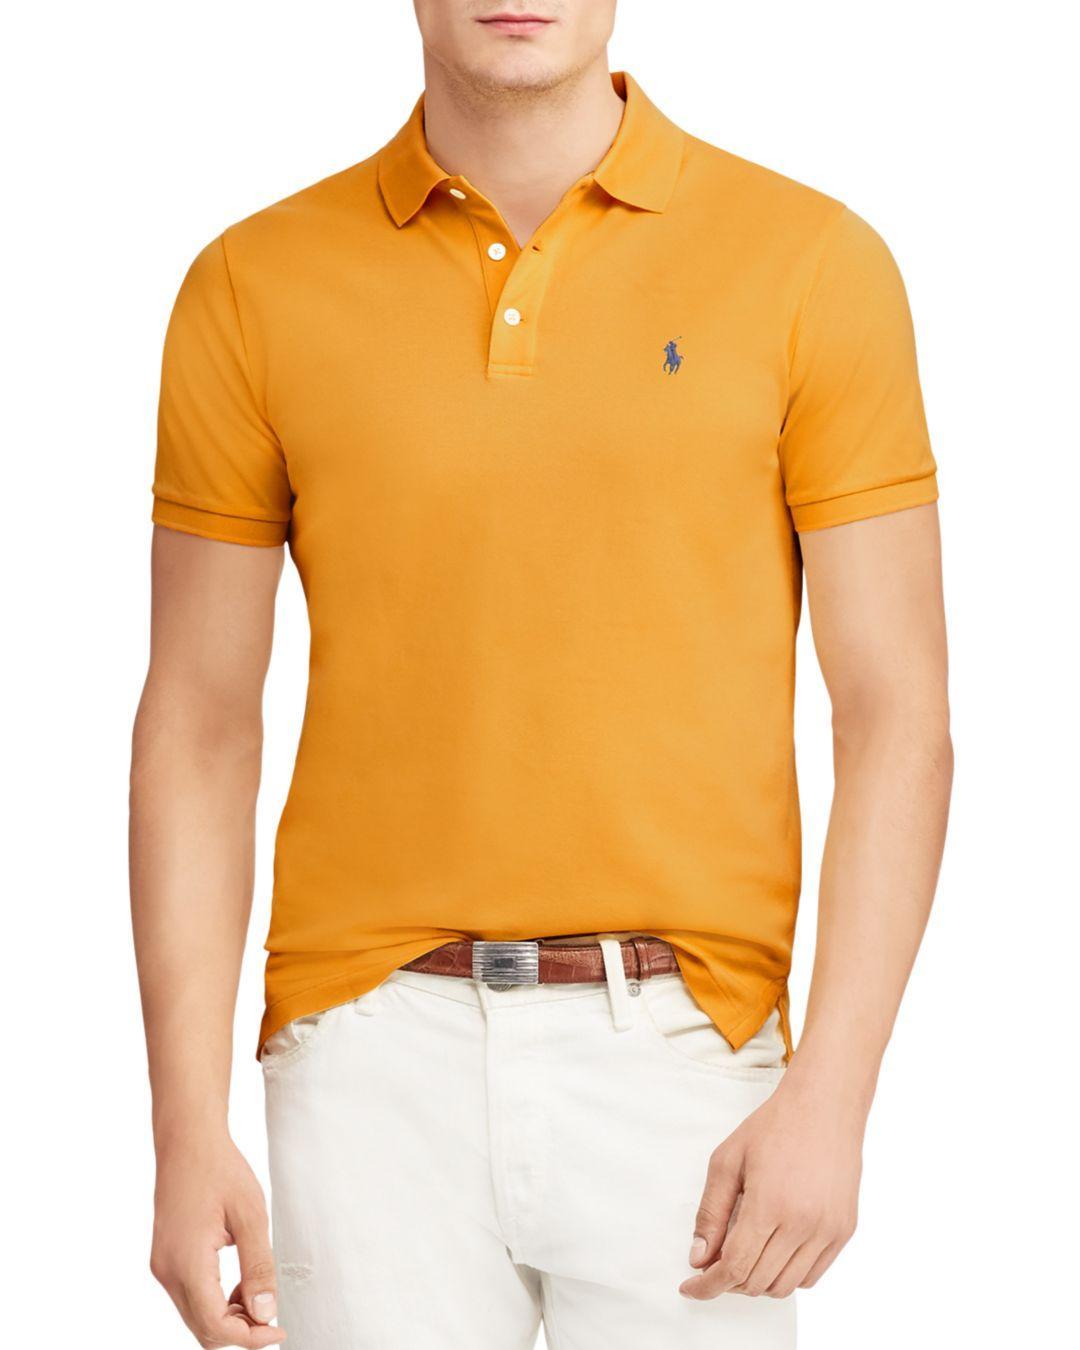 c2552171c8b Lyst - Polo Ralph Lauren Stretch Mesh Custom Slim Fit Polo Shirt in ...